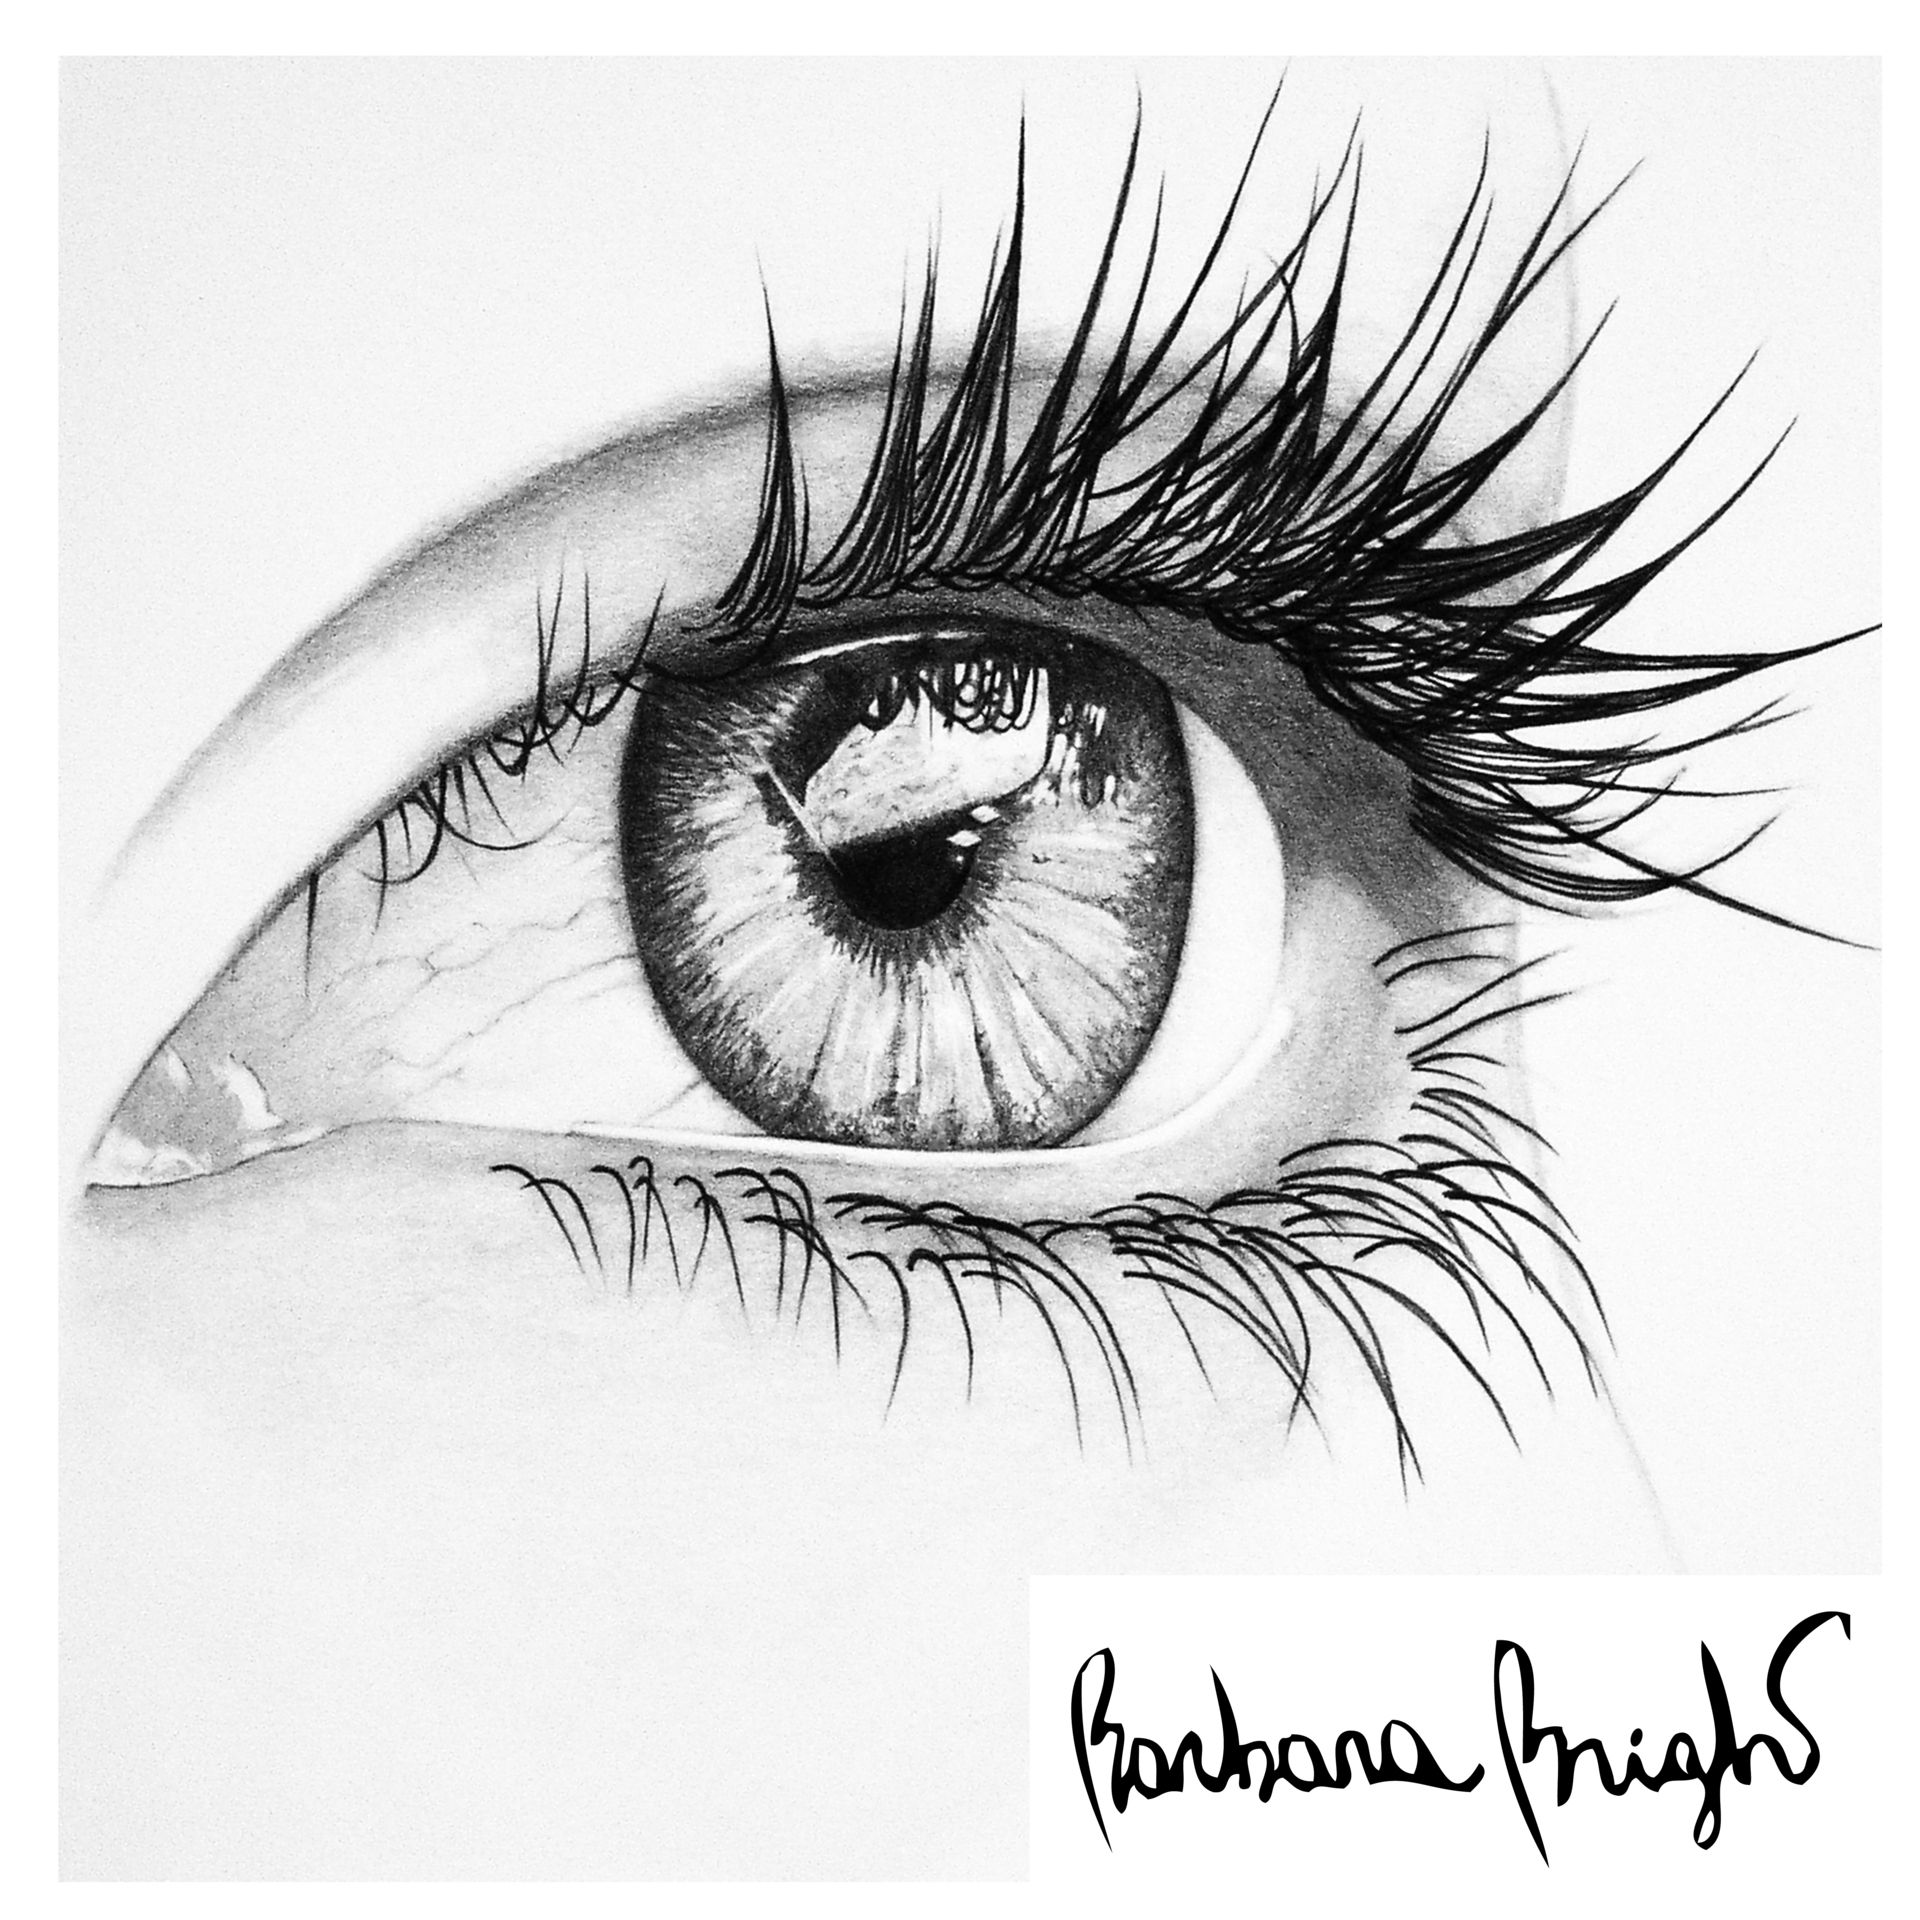 Saatchi art artist barbara bright pencil 2013 drawing dream